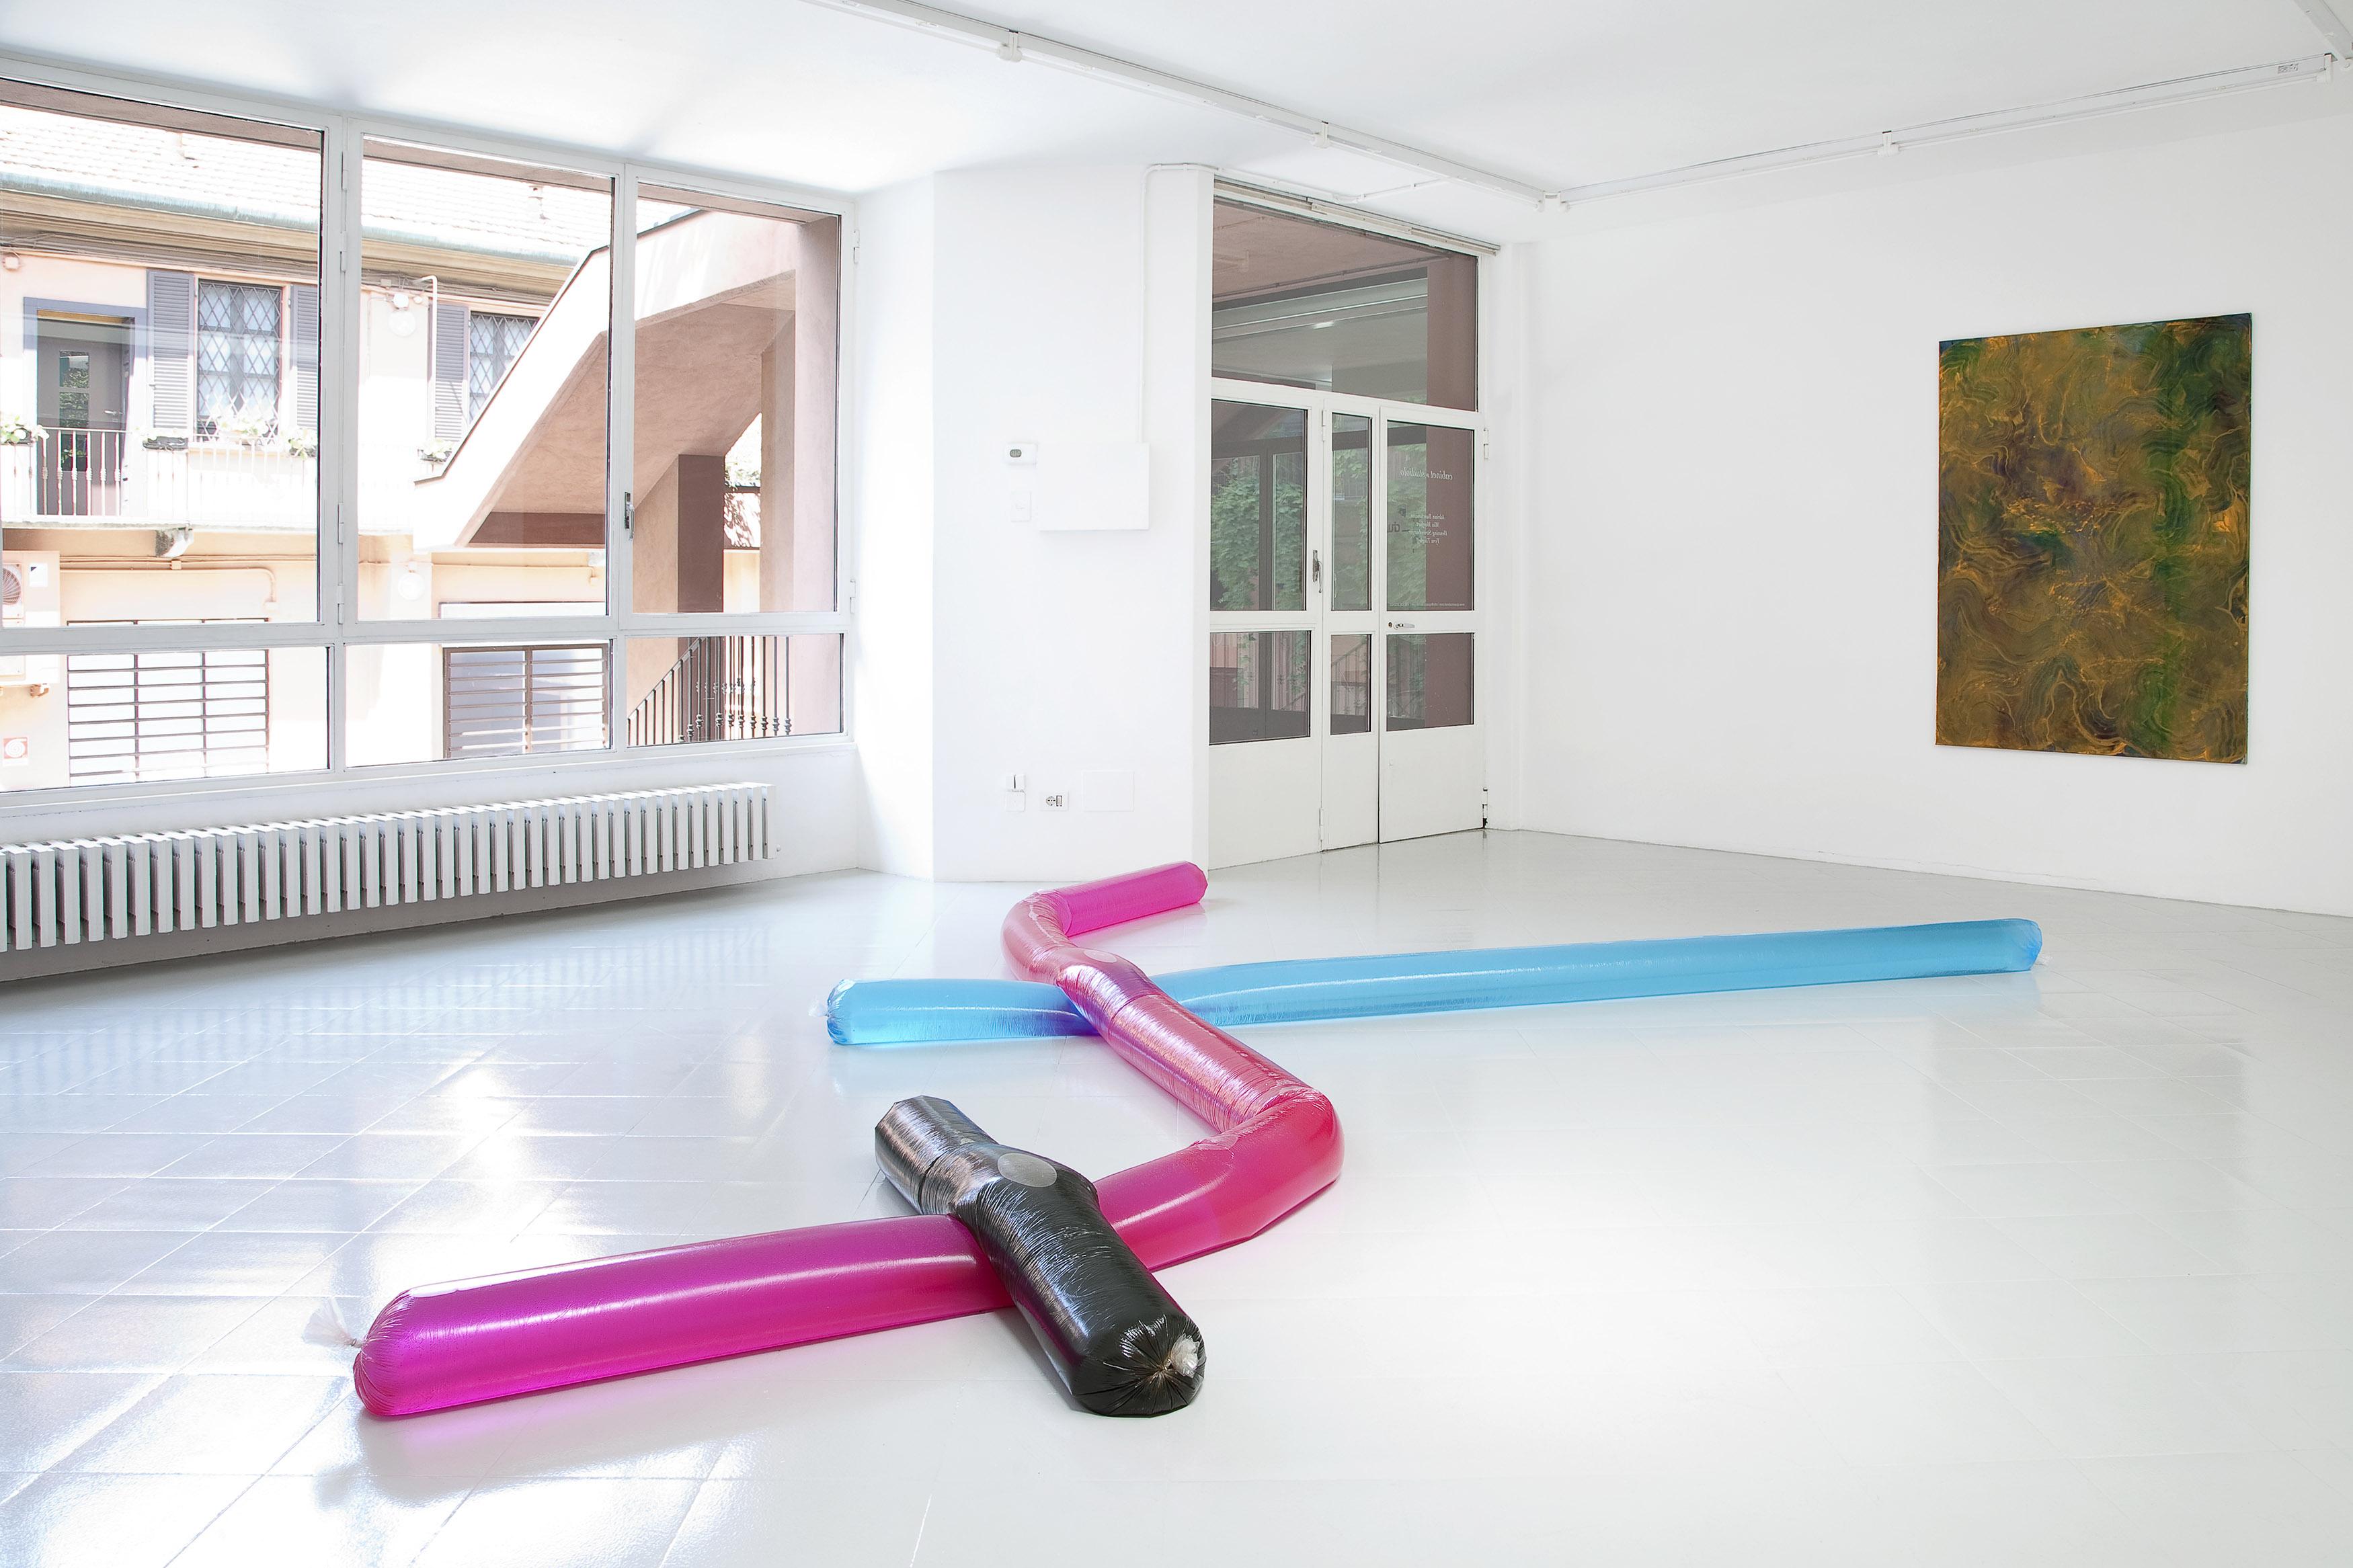 13 - Adrian Buschmann Mia Marfurt Henning Strassburger Tyra Tingleff Installation View 2015 - Courtesy Studiolo Milan Photo Filippo Armellin